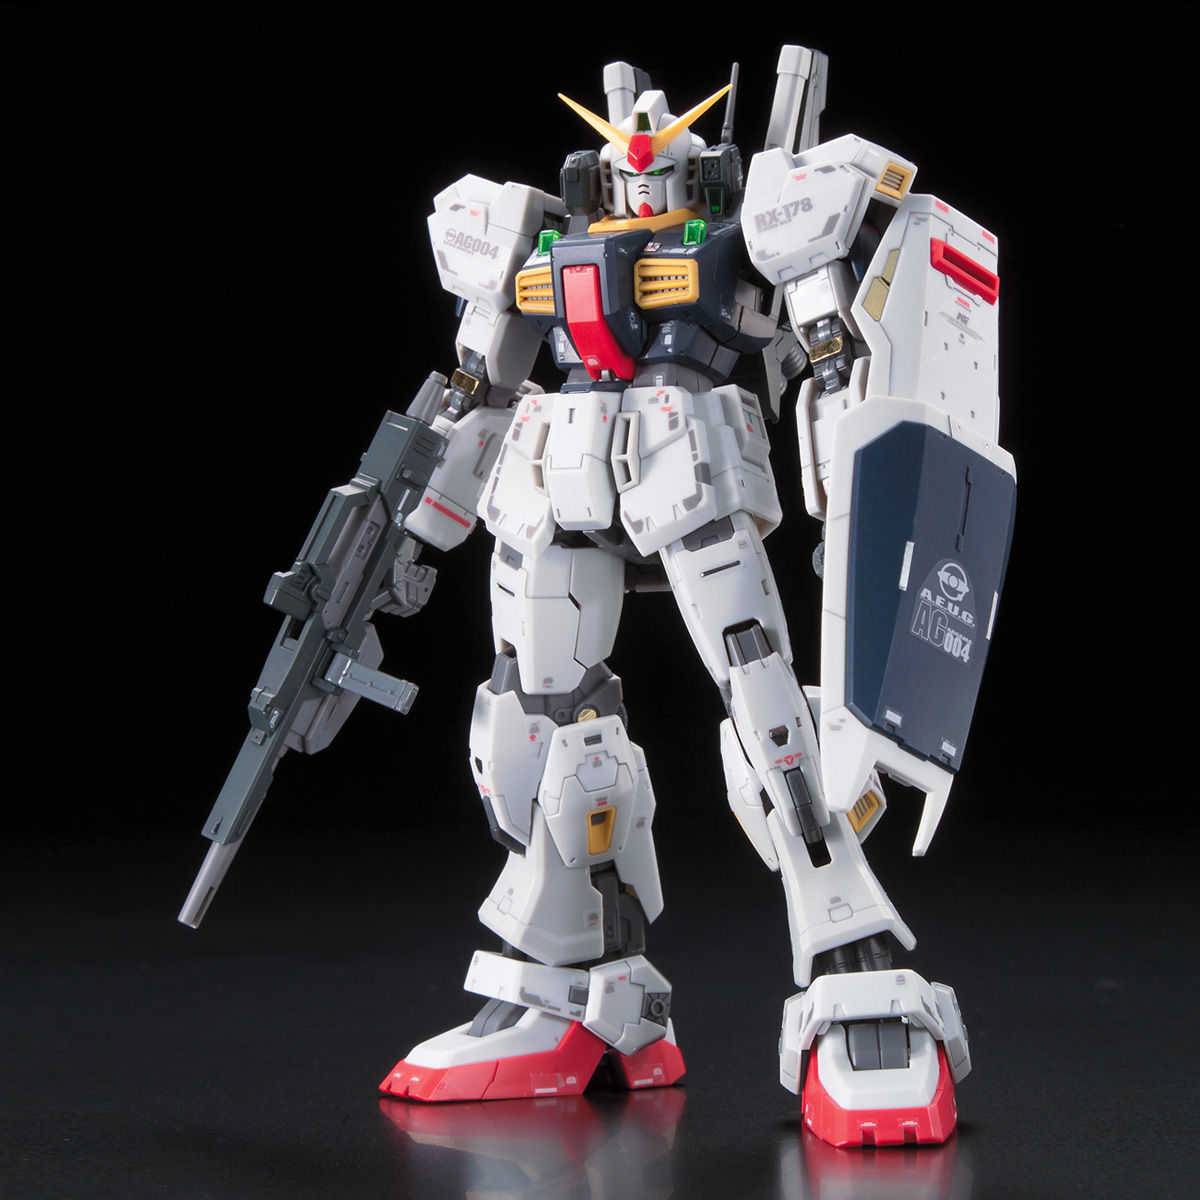 RG 1/144 鋼彈Mk-Ⅱ(幽谷規格)